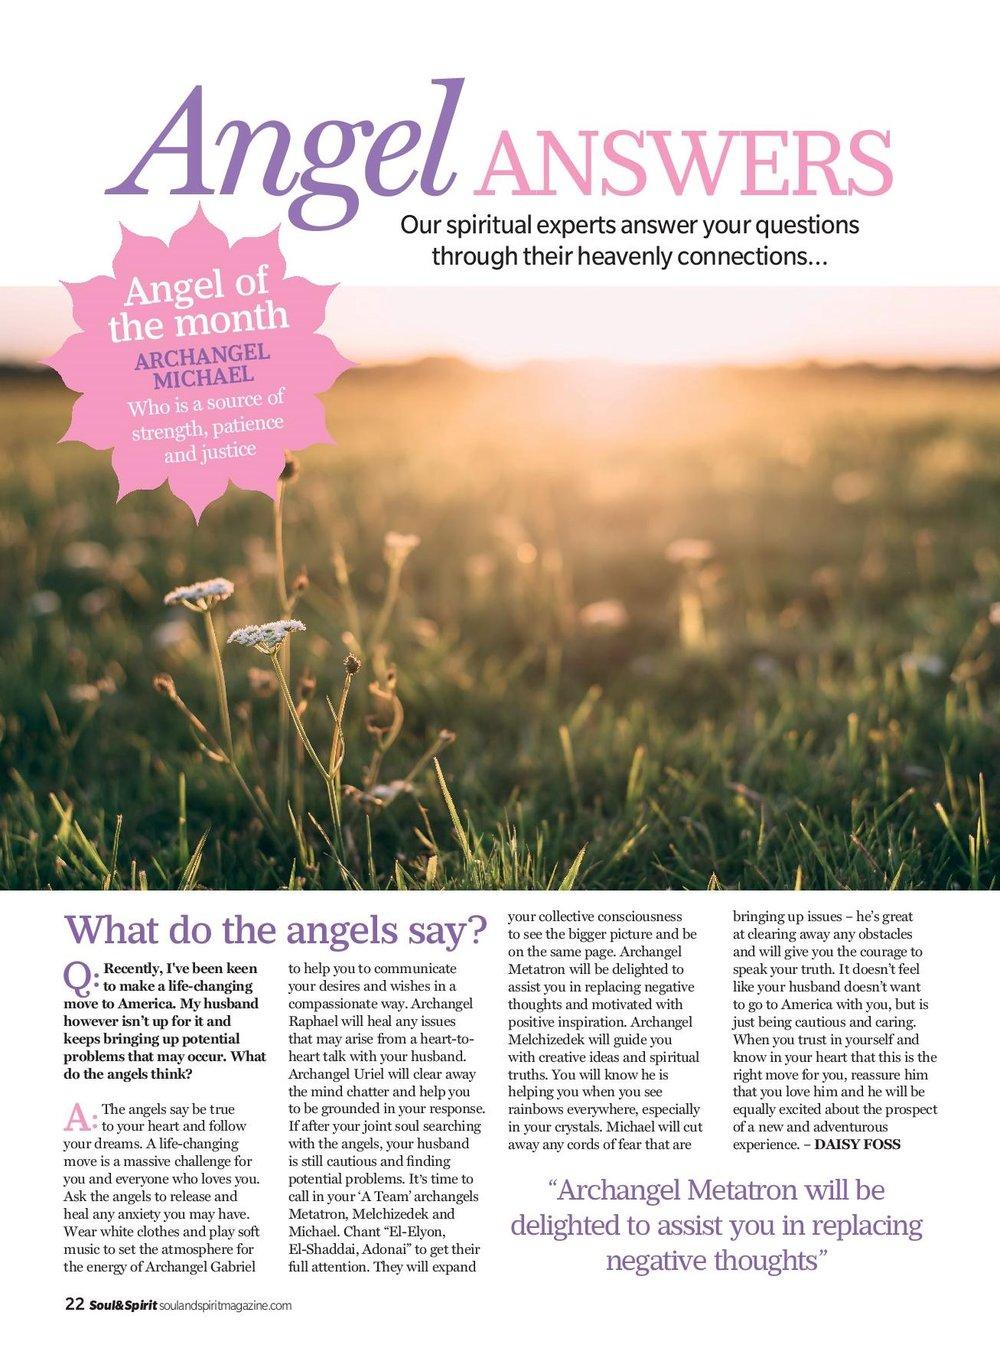 Angel Answers - Soul & Spirit November 2017 — Daisy Foss